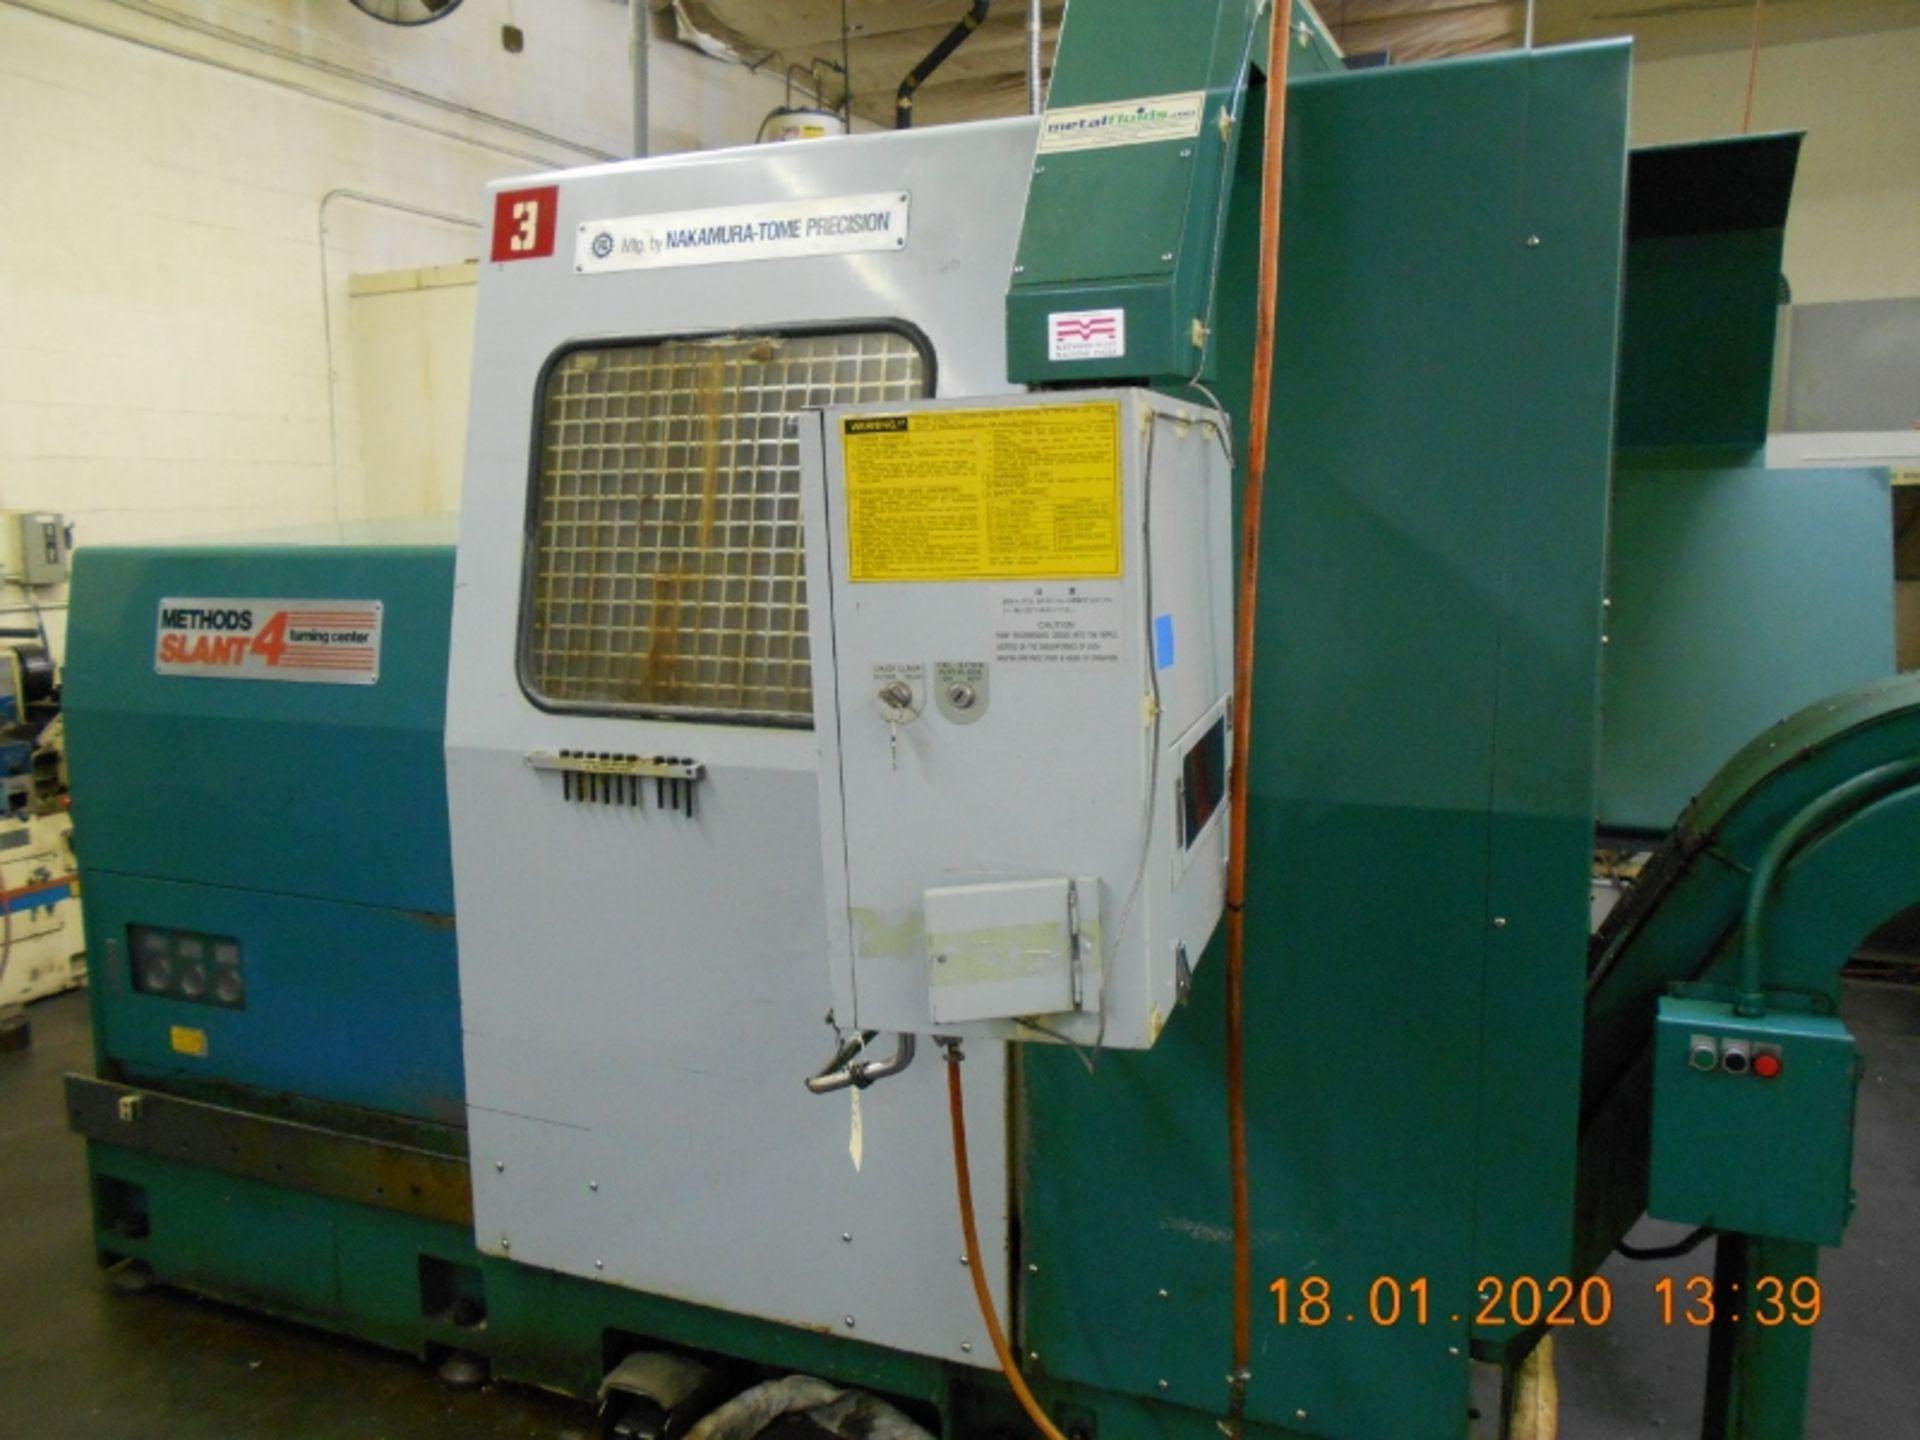 Lot 8 - Nakamura Tome Slant 4 CNC Turning Center with Fanuc 11T Controls SB-4 Serial # C44002